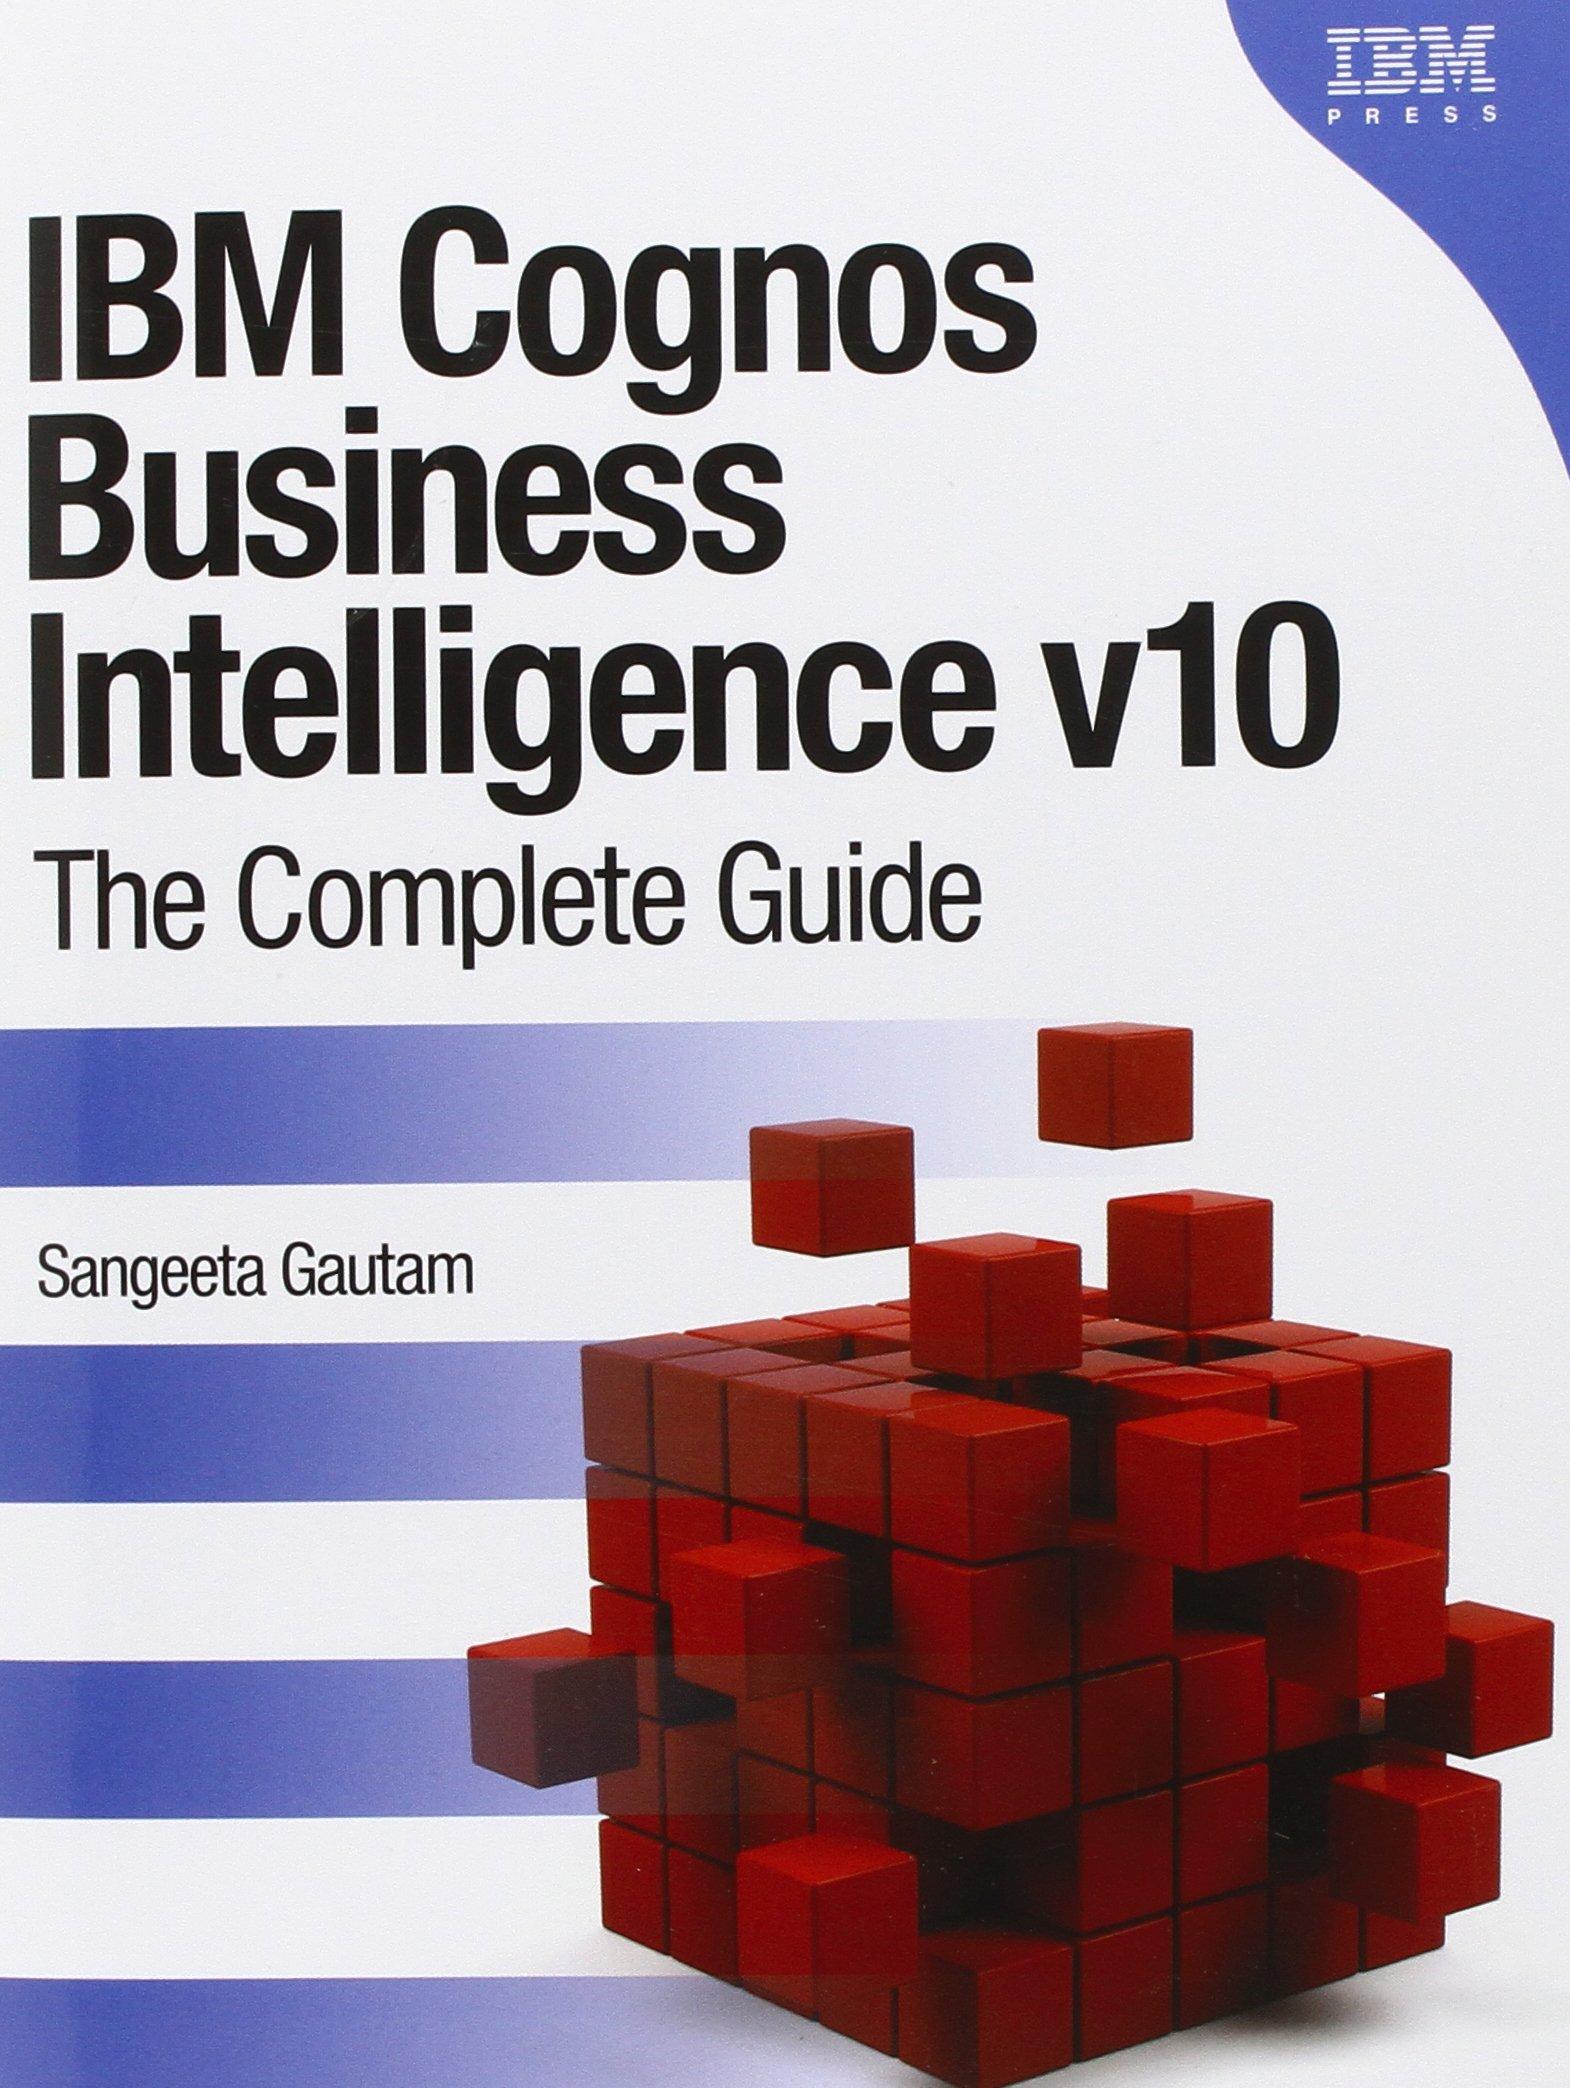 Buy Ibm Cognos Business Intelligence V10 The Complete Guide Book